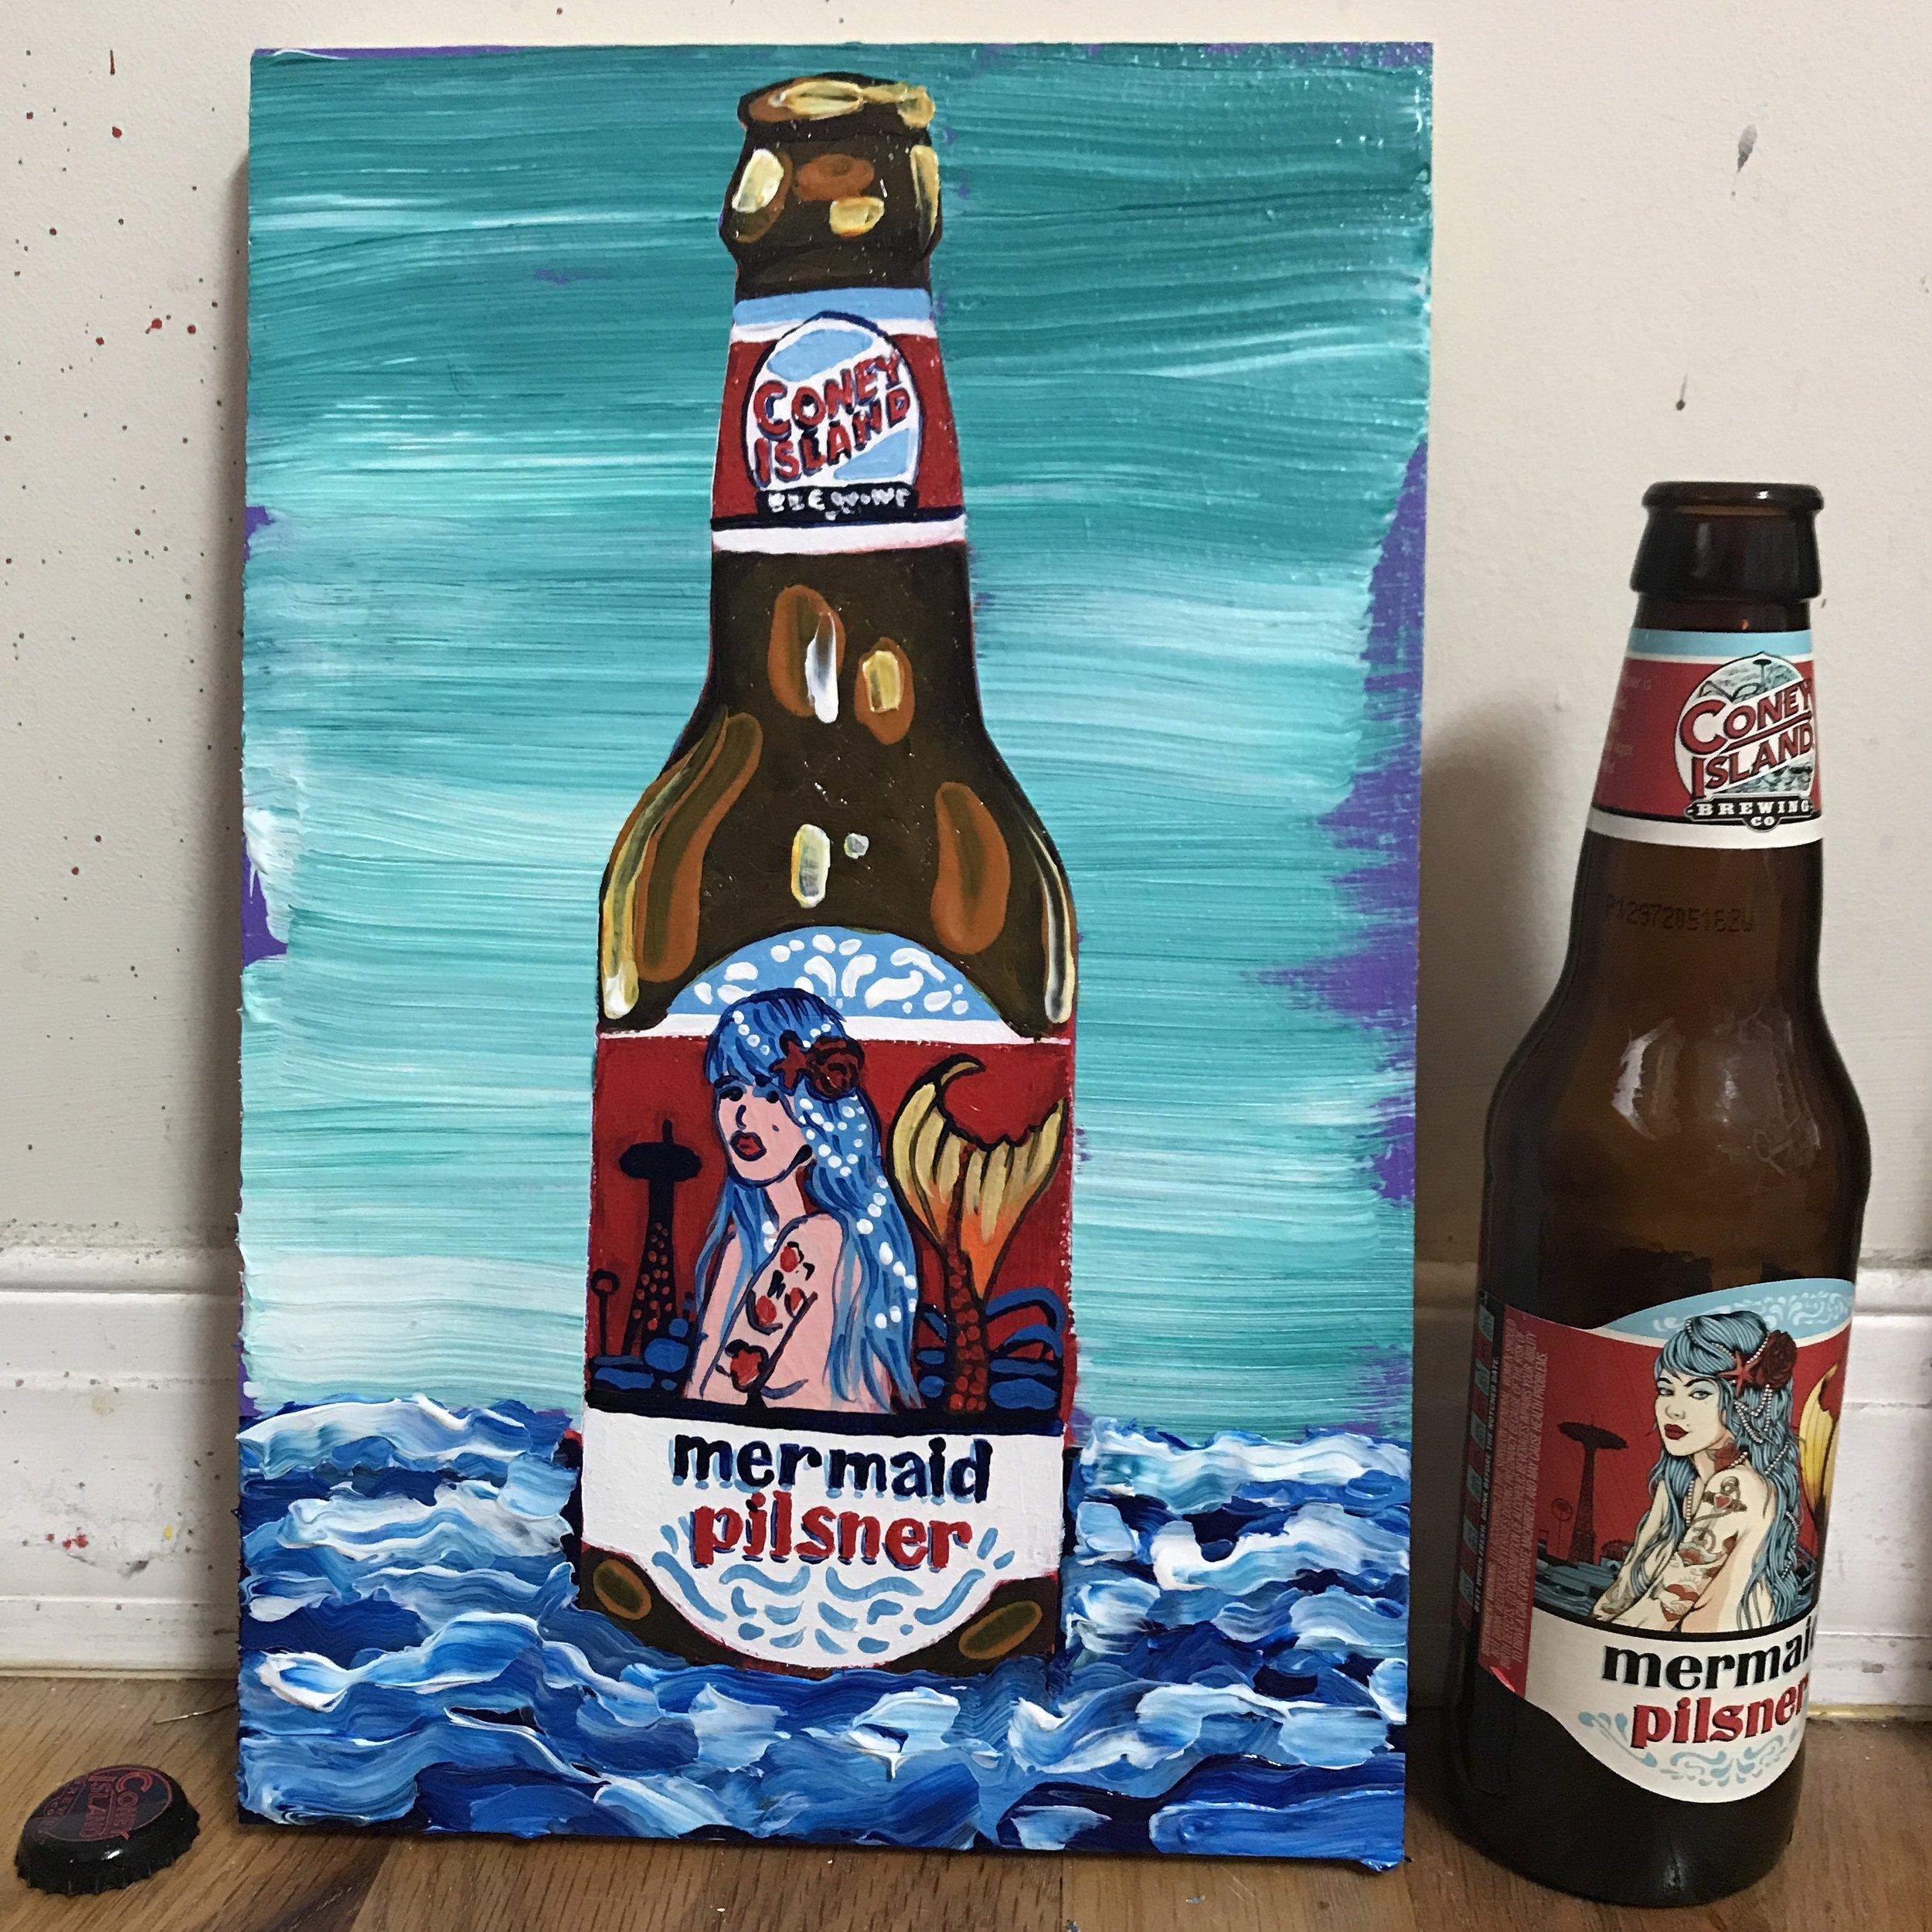 60 Coney Island mermaid pilsner (USA)